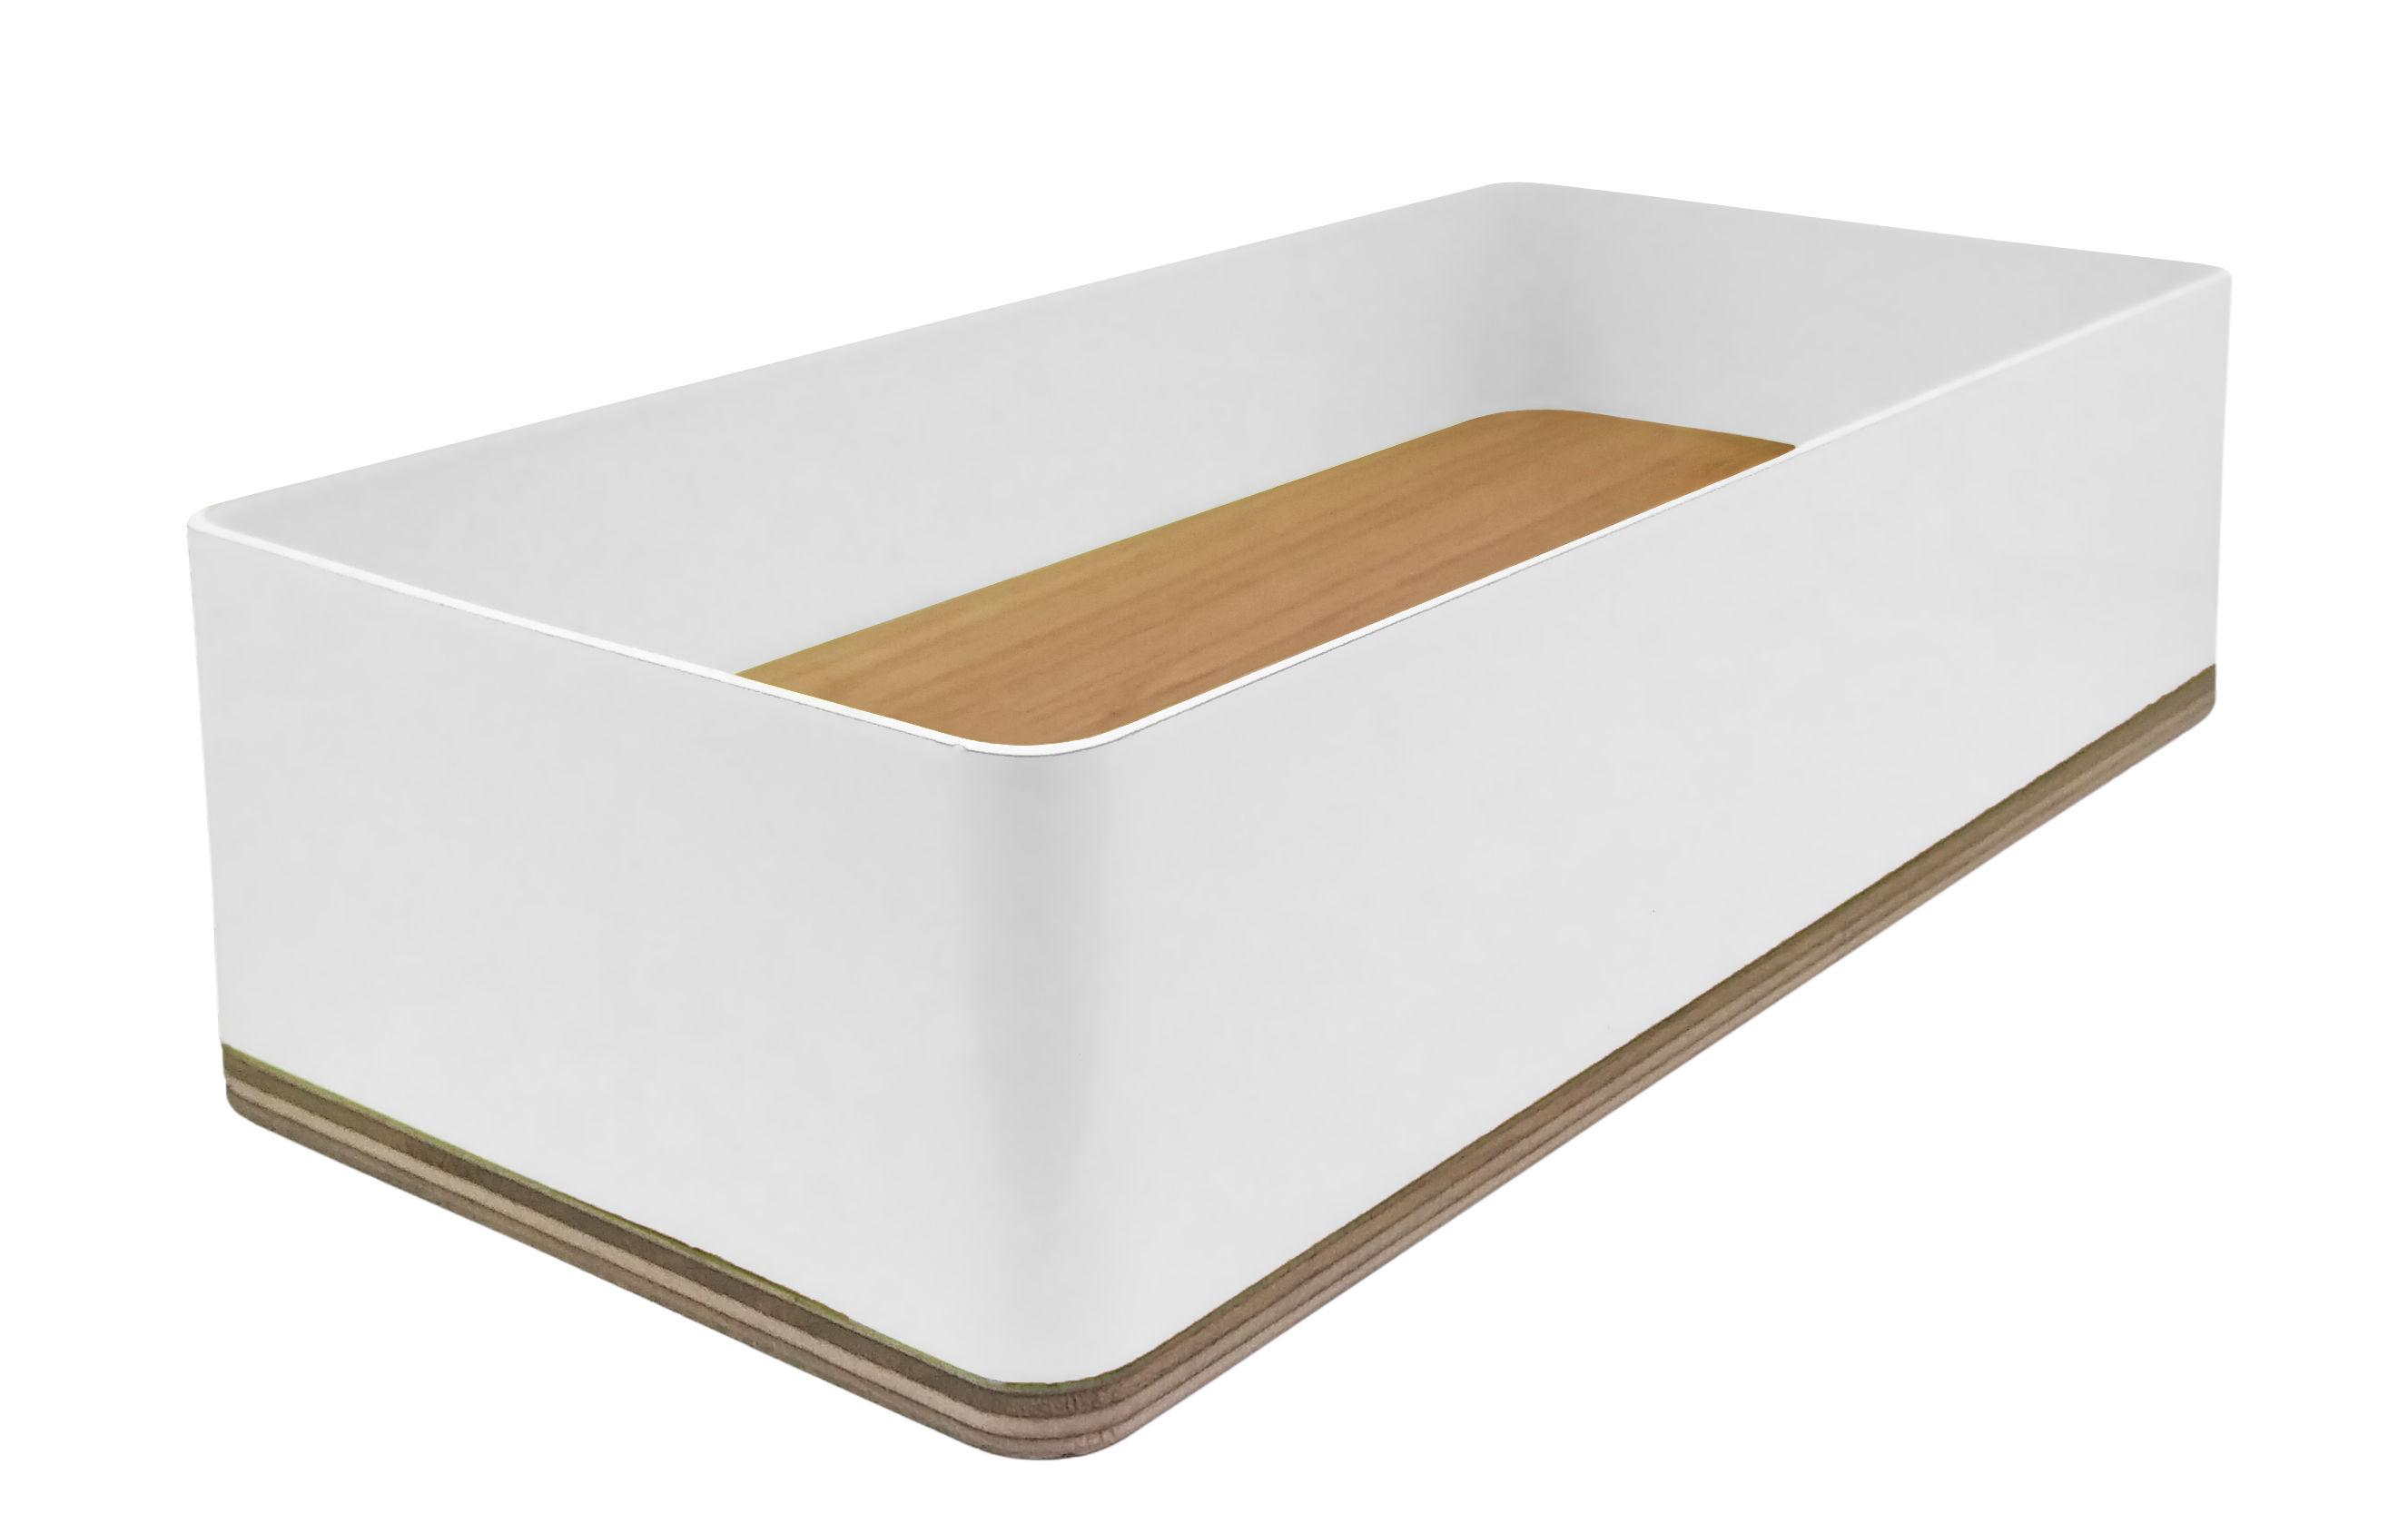 porte crayons portable atelier moleskine bas blanc driade. Black Bedroom Furniture Sets. Home Design Ideas